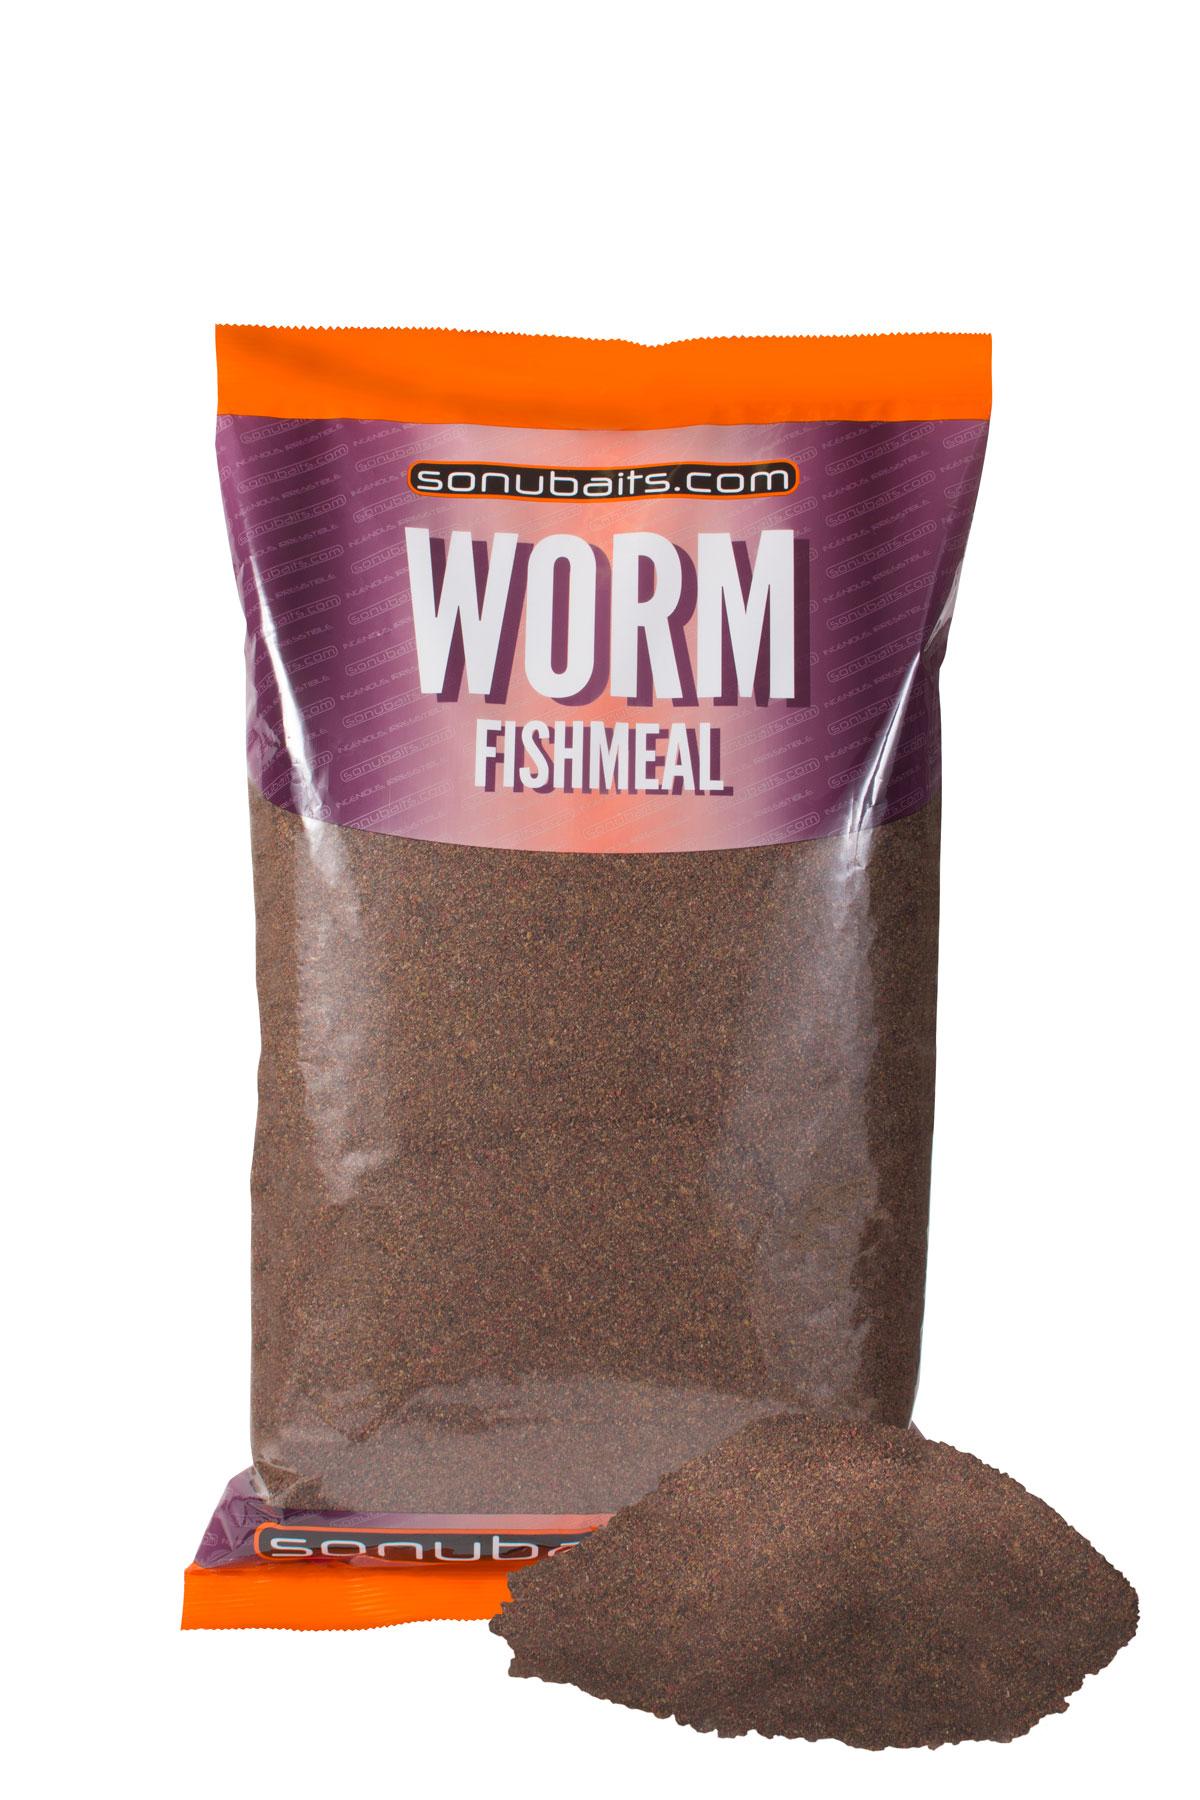 Sonubaits Worm Fishmeal